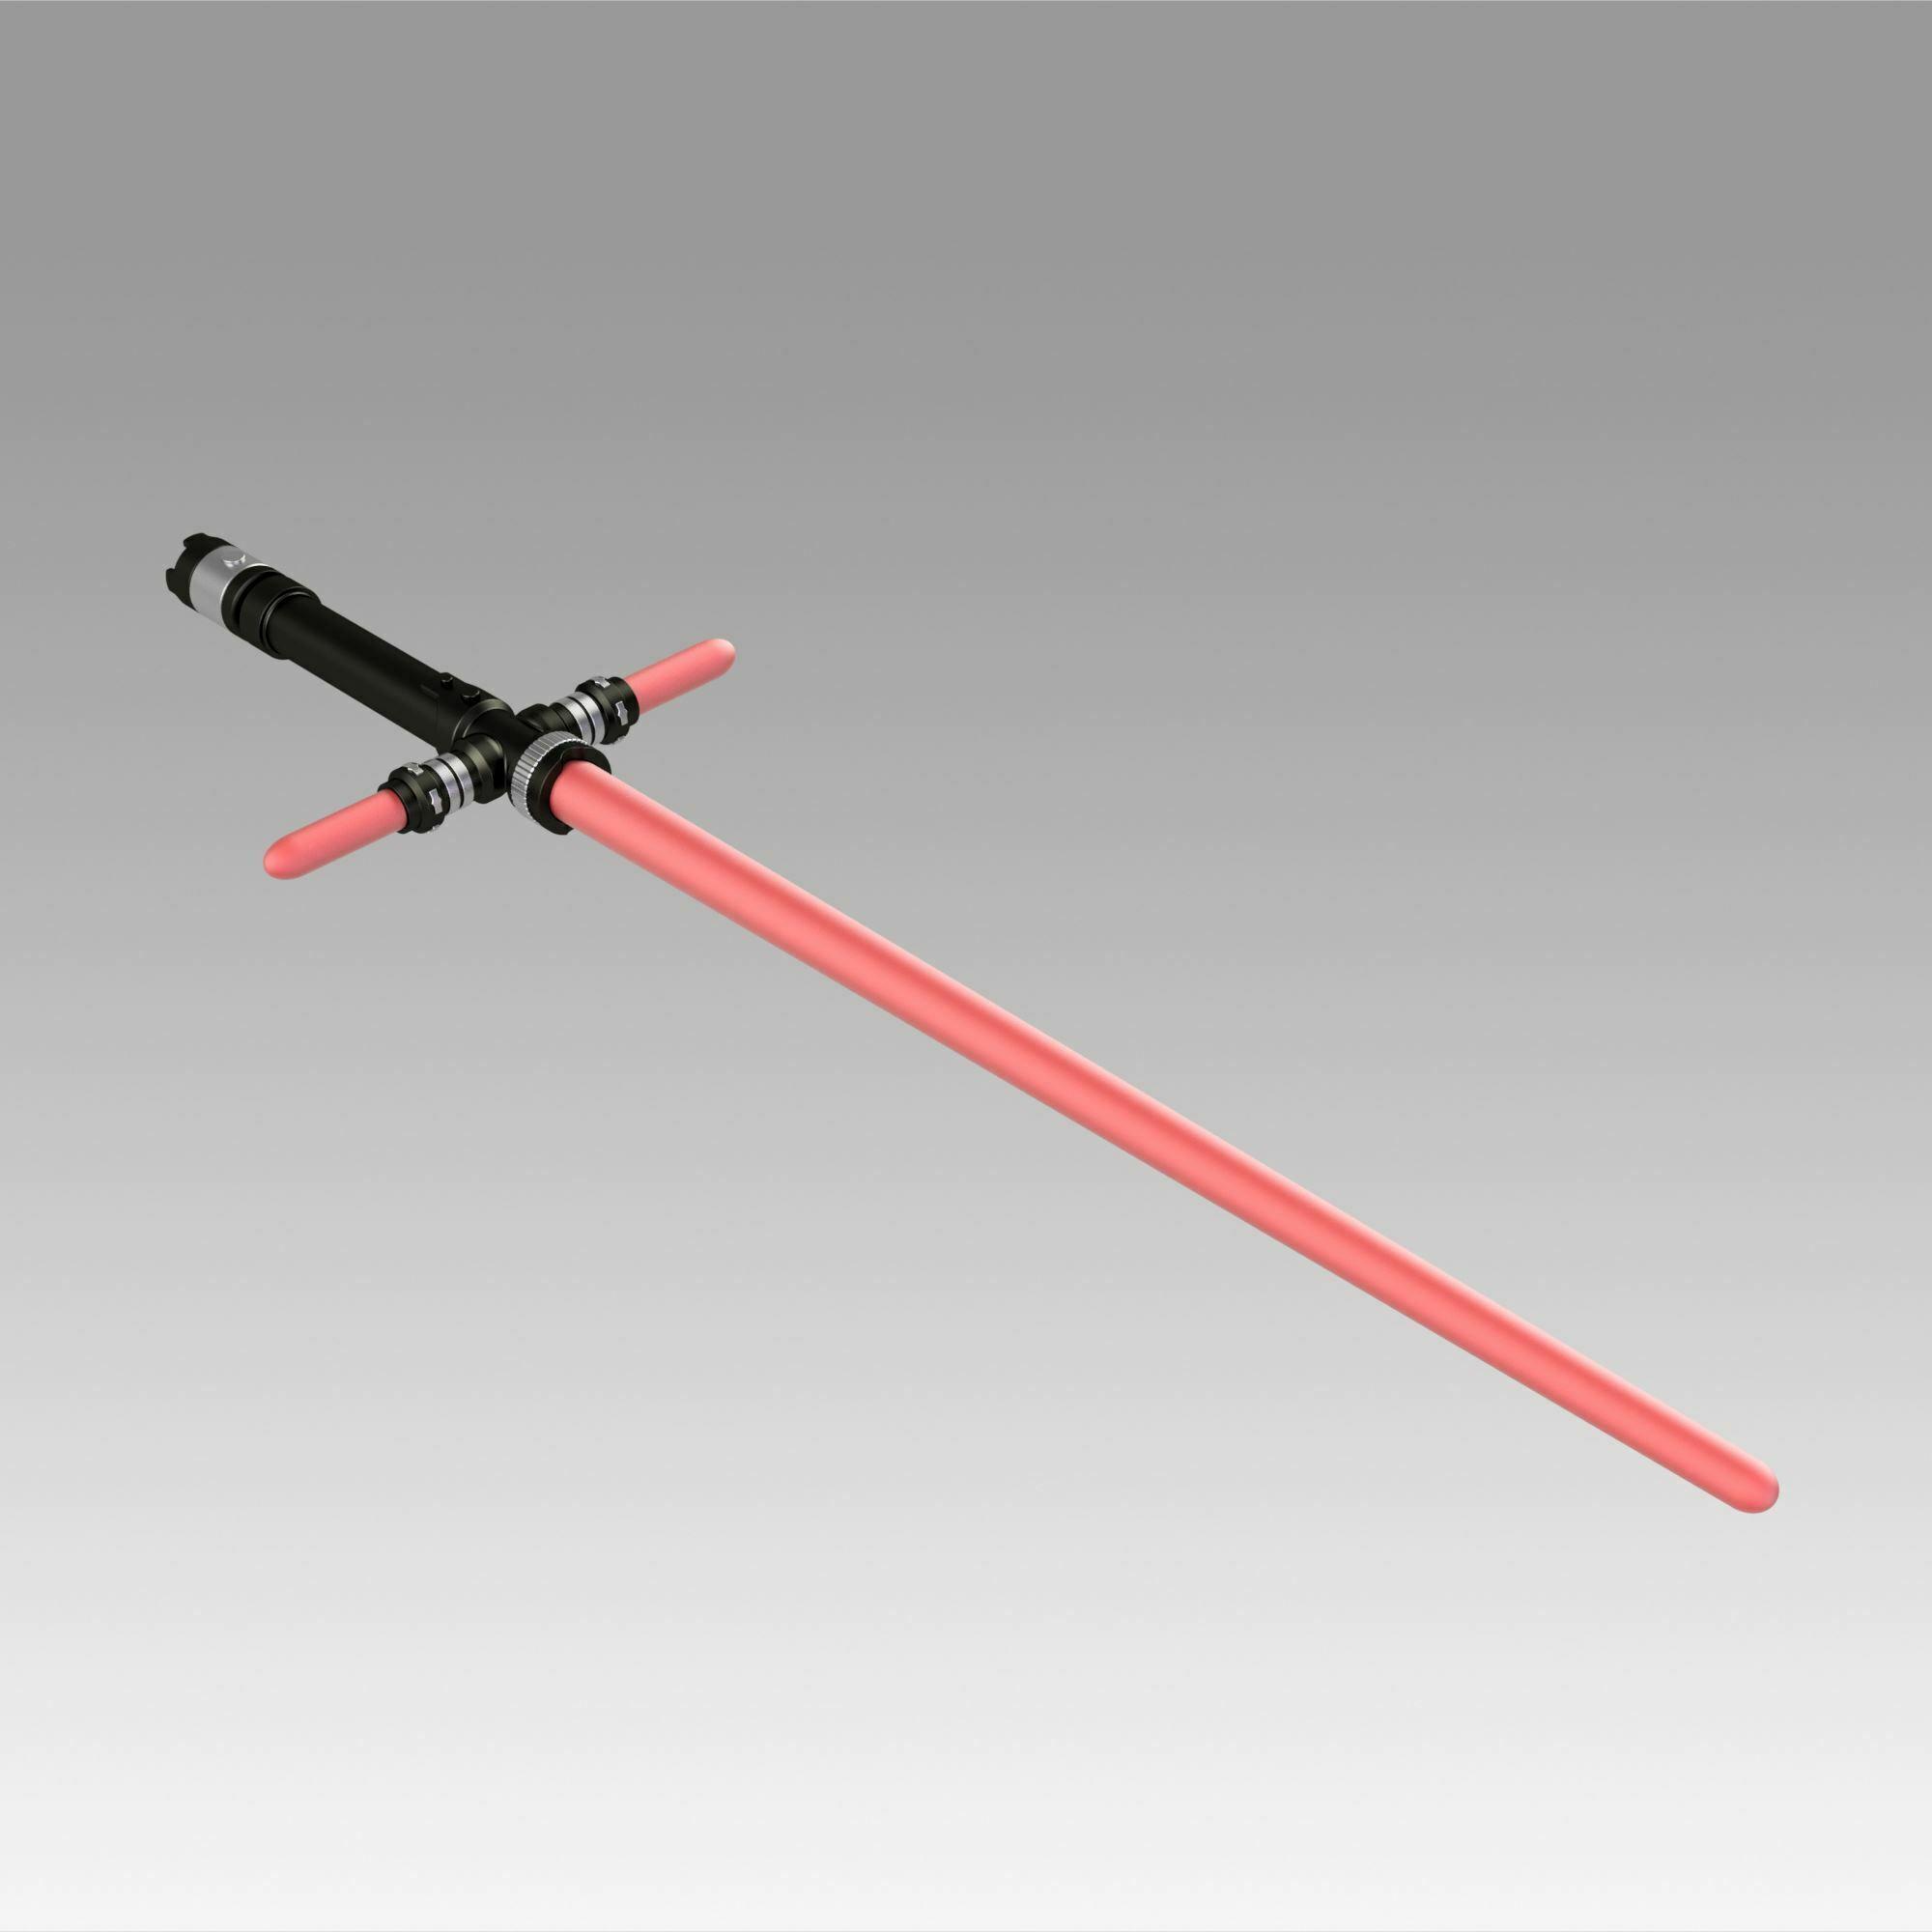 4.jpg Download OBJ file Star Wars VII The Force Awakens Kylo Ren Sword Cosplay Prop • 3D printer object, Blackeveryday